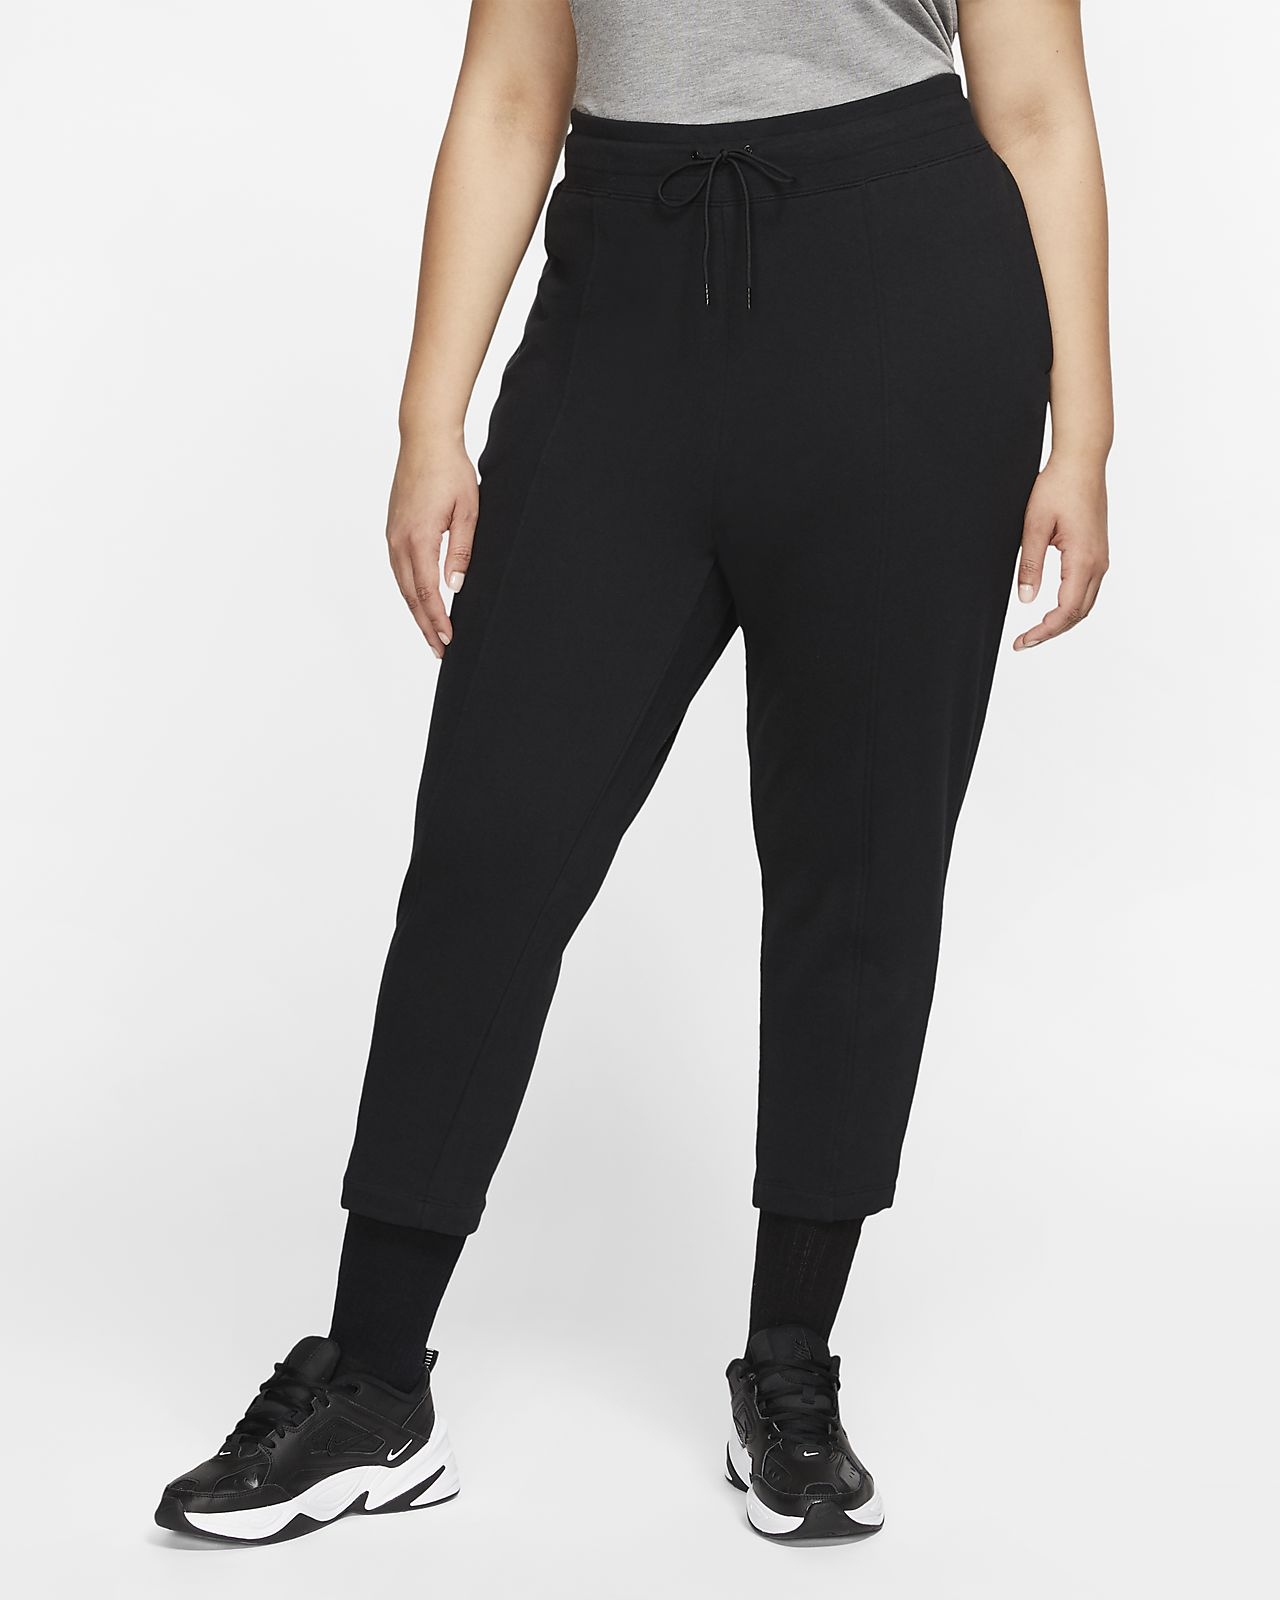 Pantalon en molleton Nike Sportswear Swoosh pour Femme (grande taille)